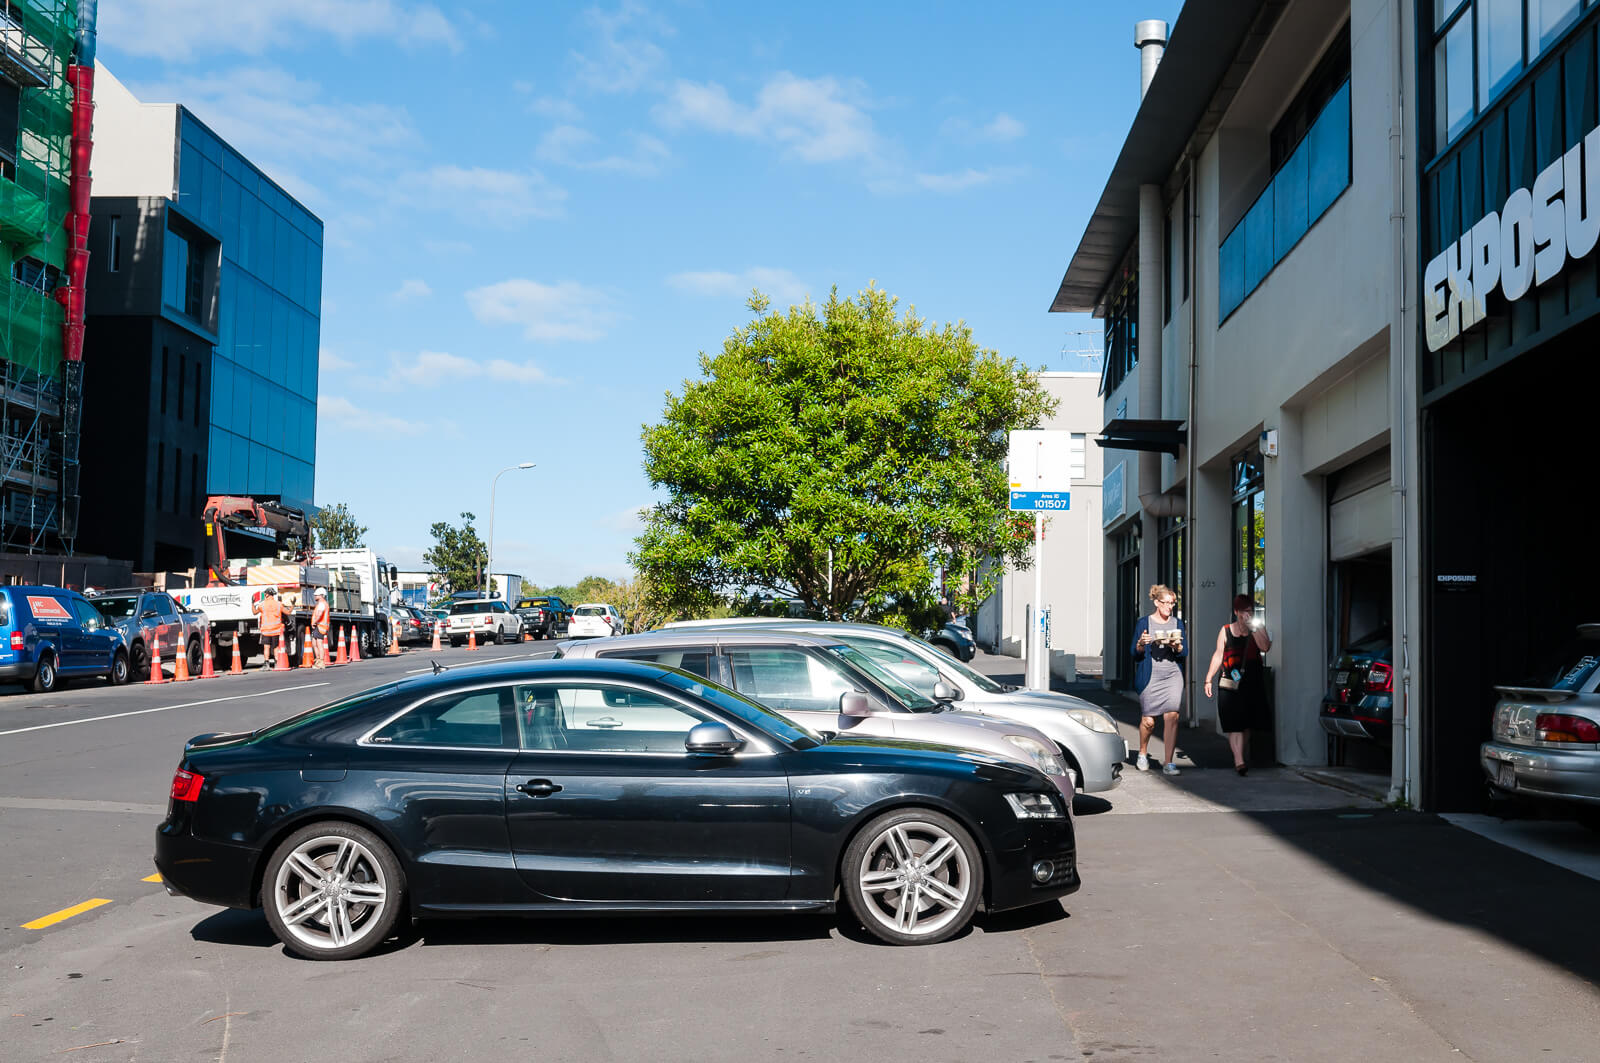 Western Victoria Quarter Part 3: Vehicle Prioritisation and ...